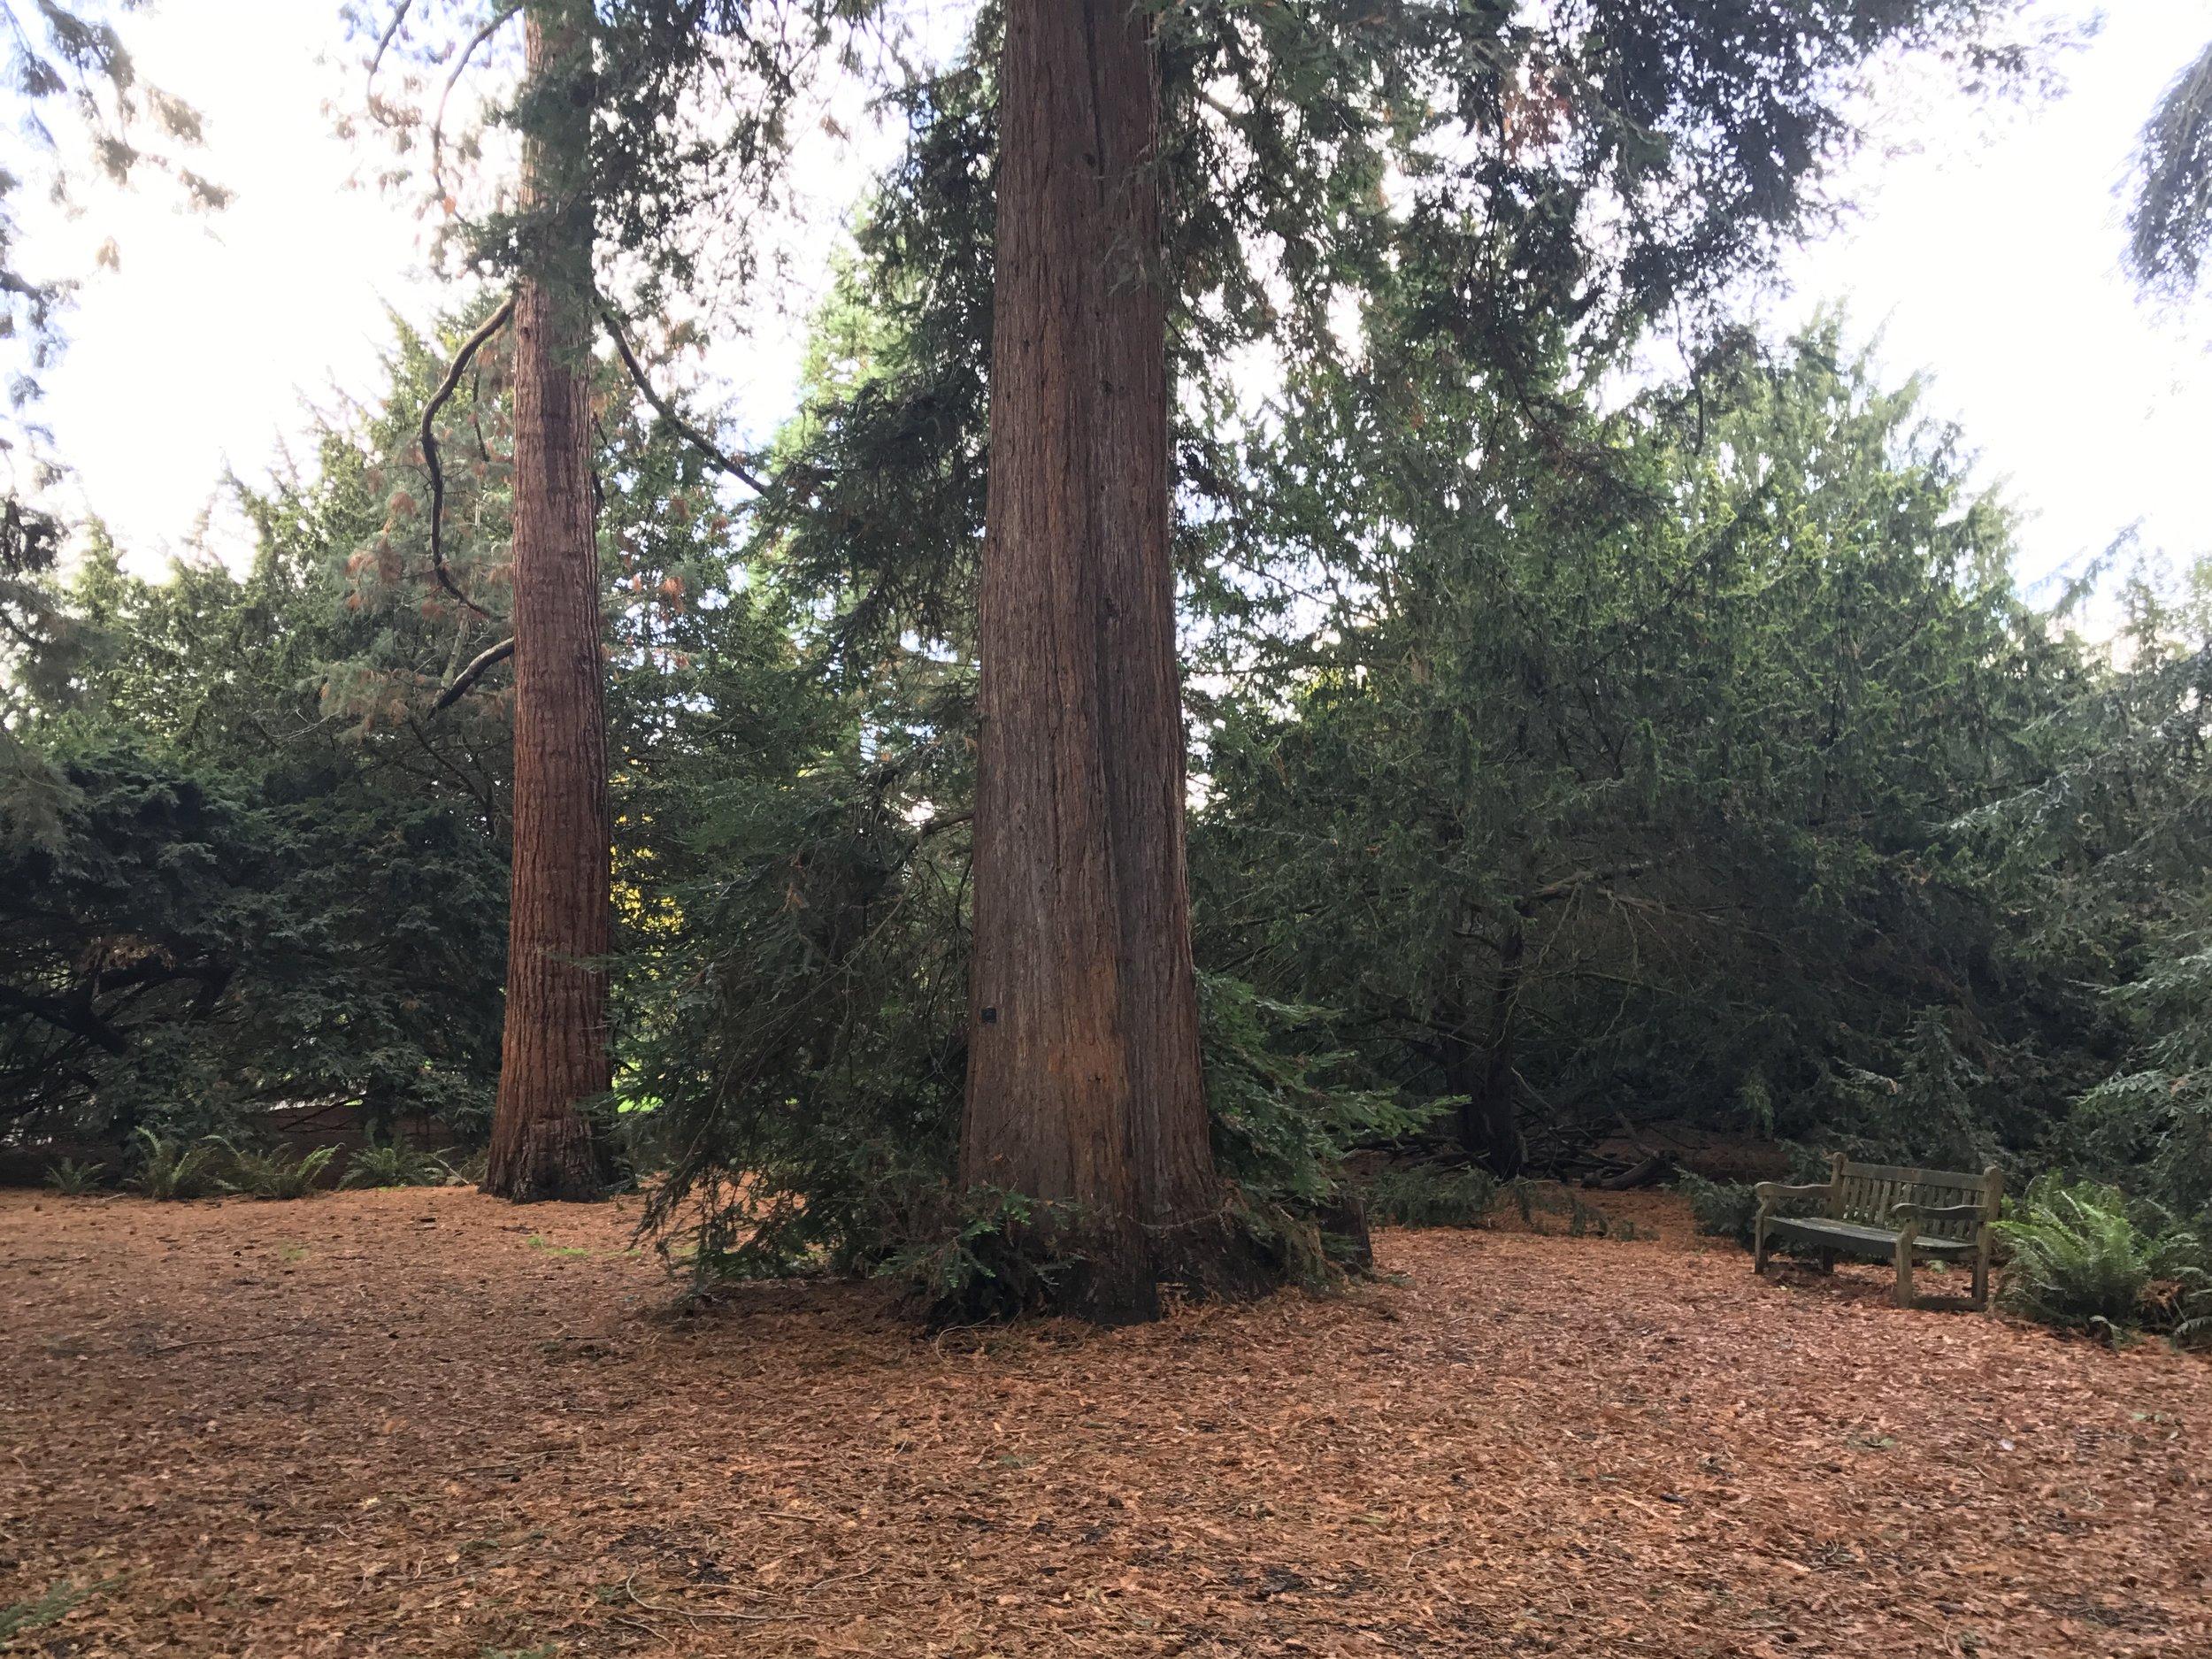 Kew Gardens – Redwood Grove